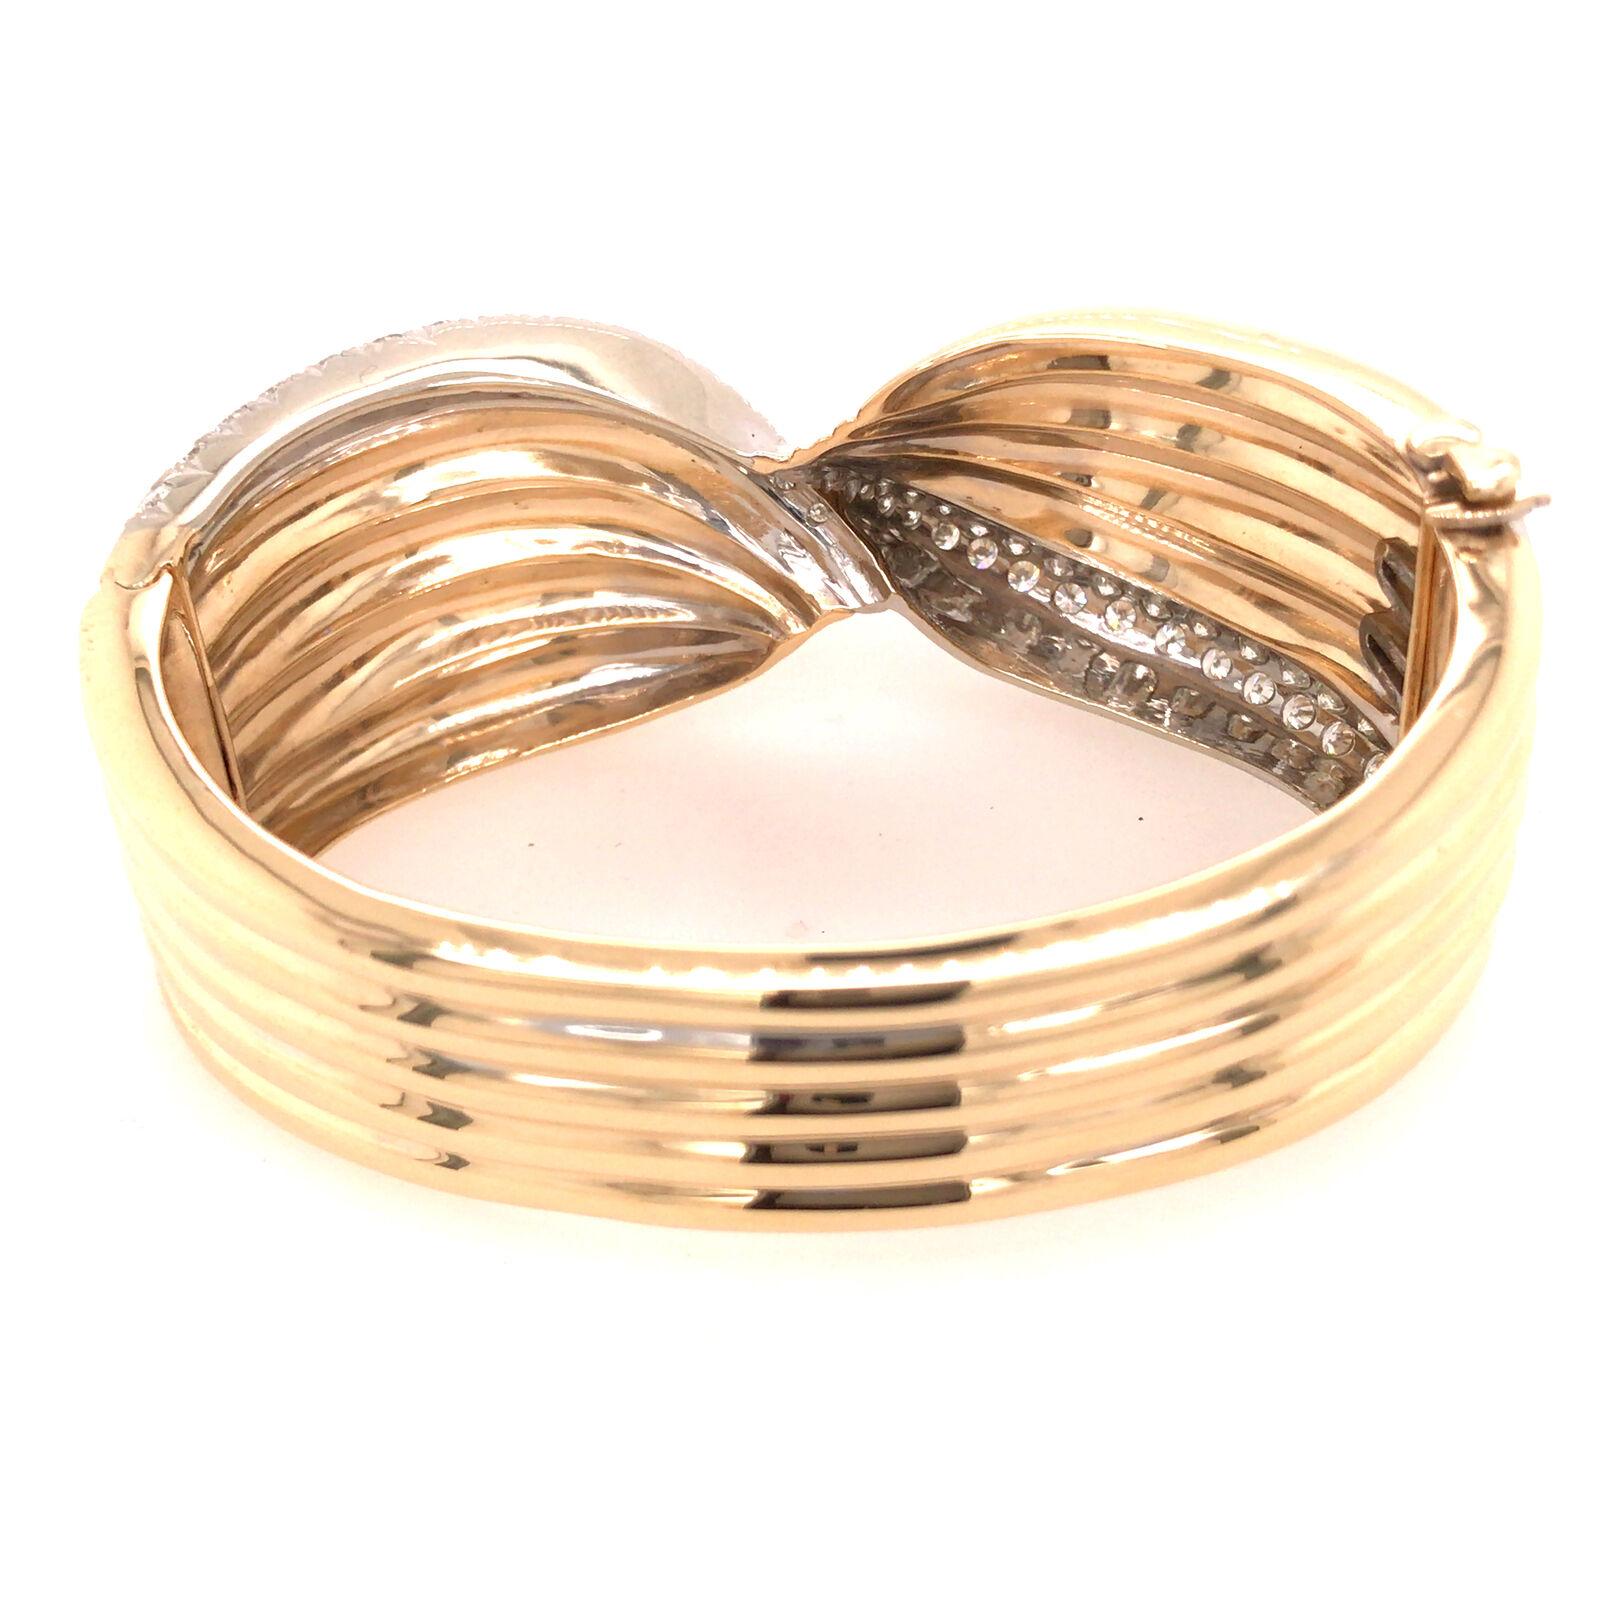 14K Wide Diamond Twist Cuff Two-Tone Gold - image 5